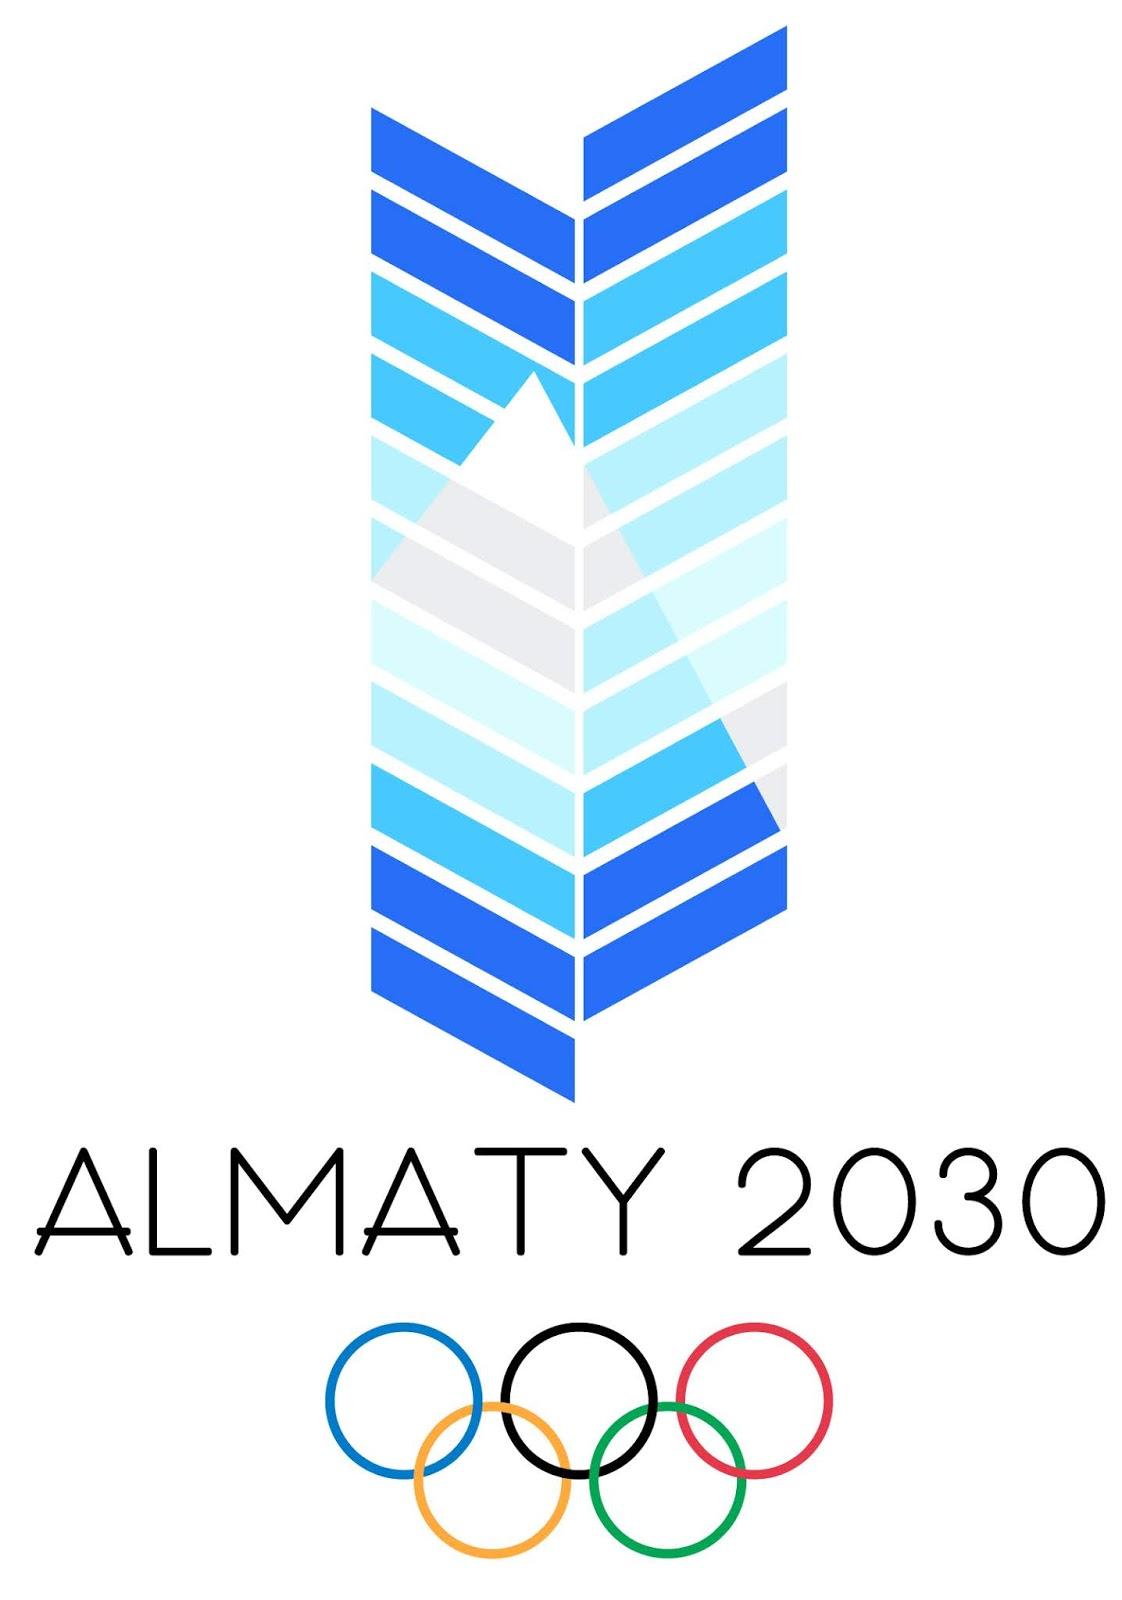 almaty-2030-paul.jpg